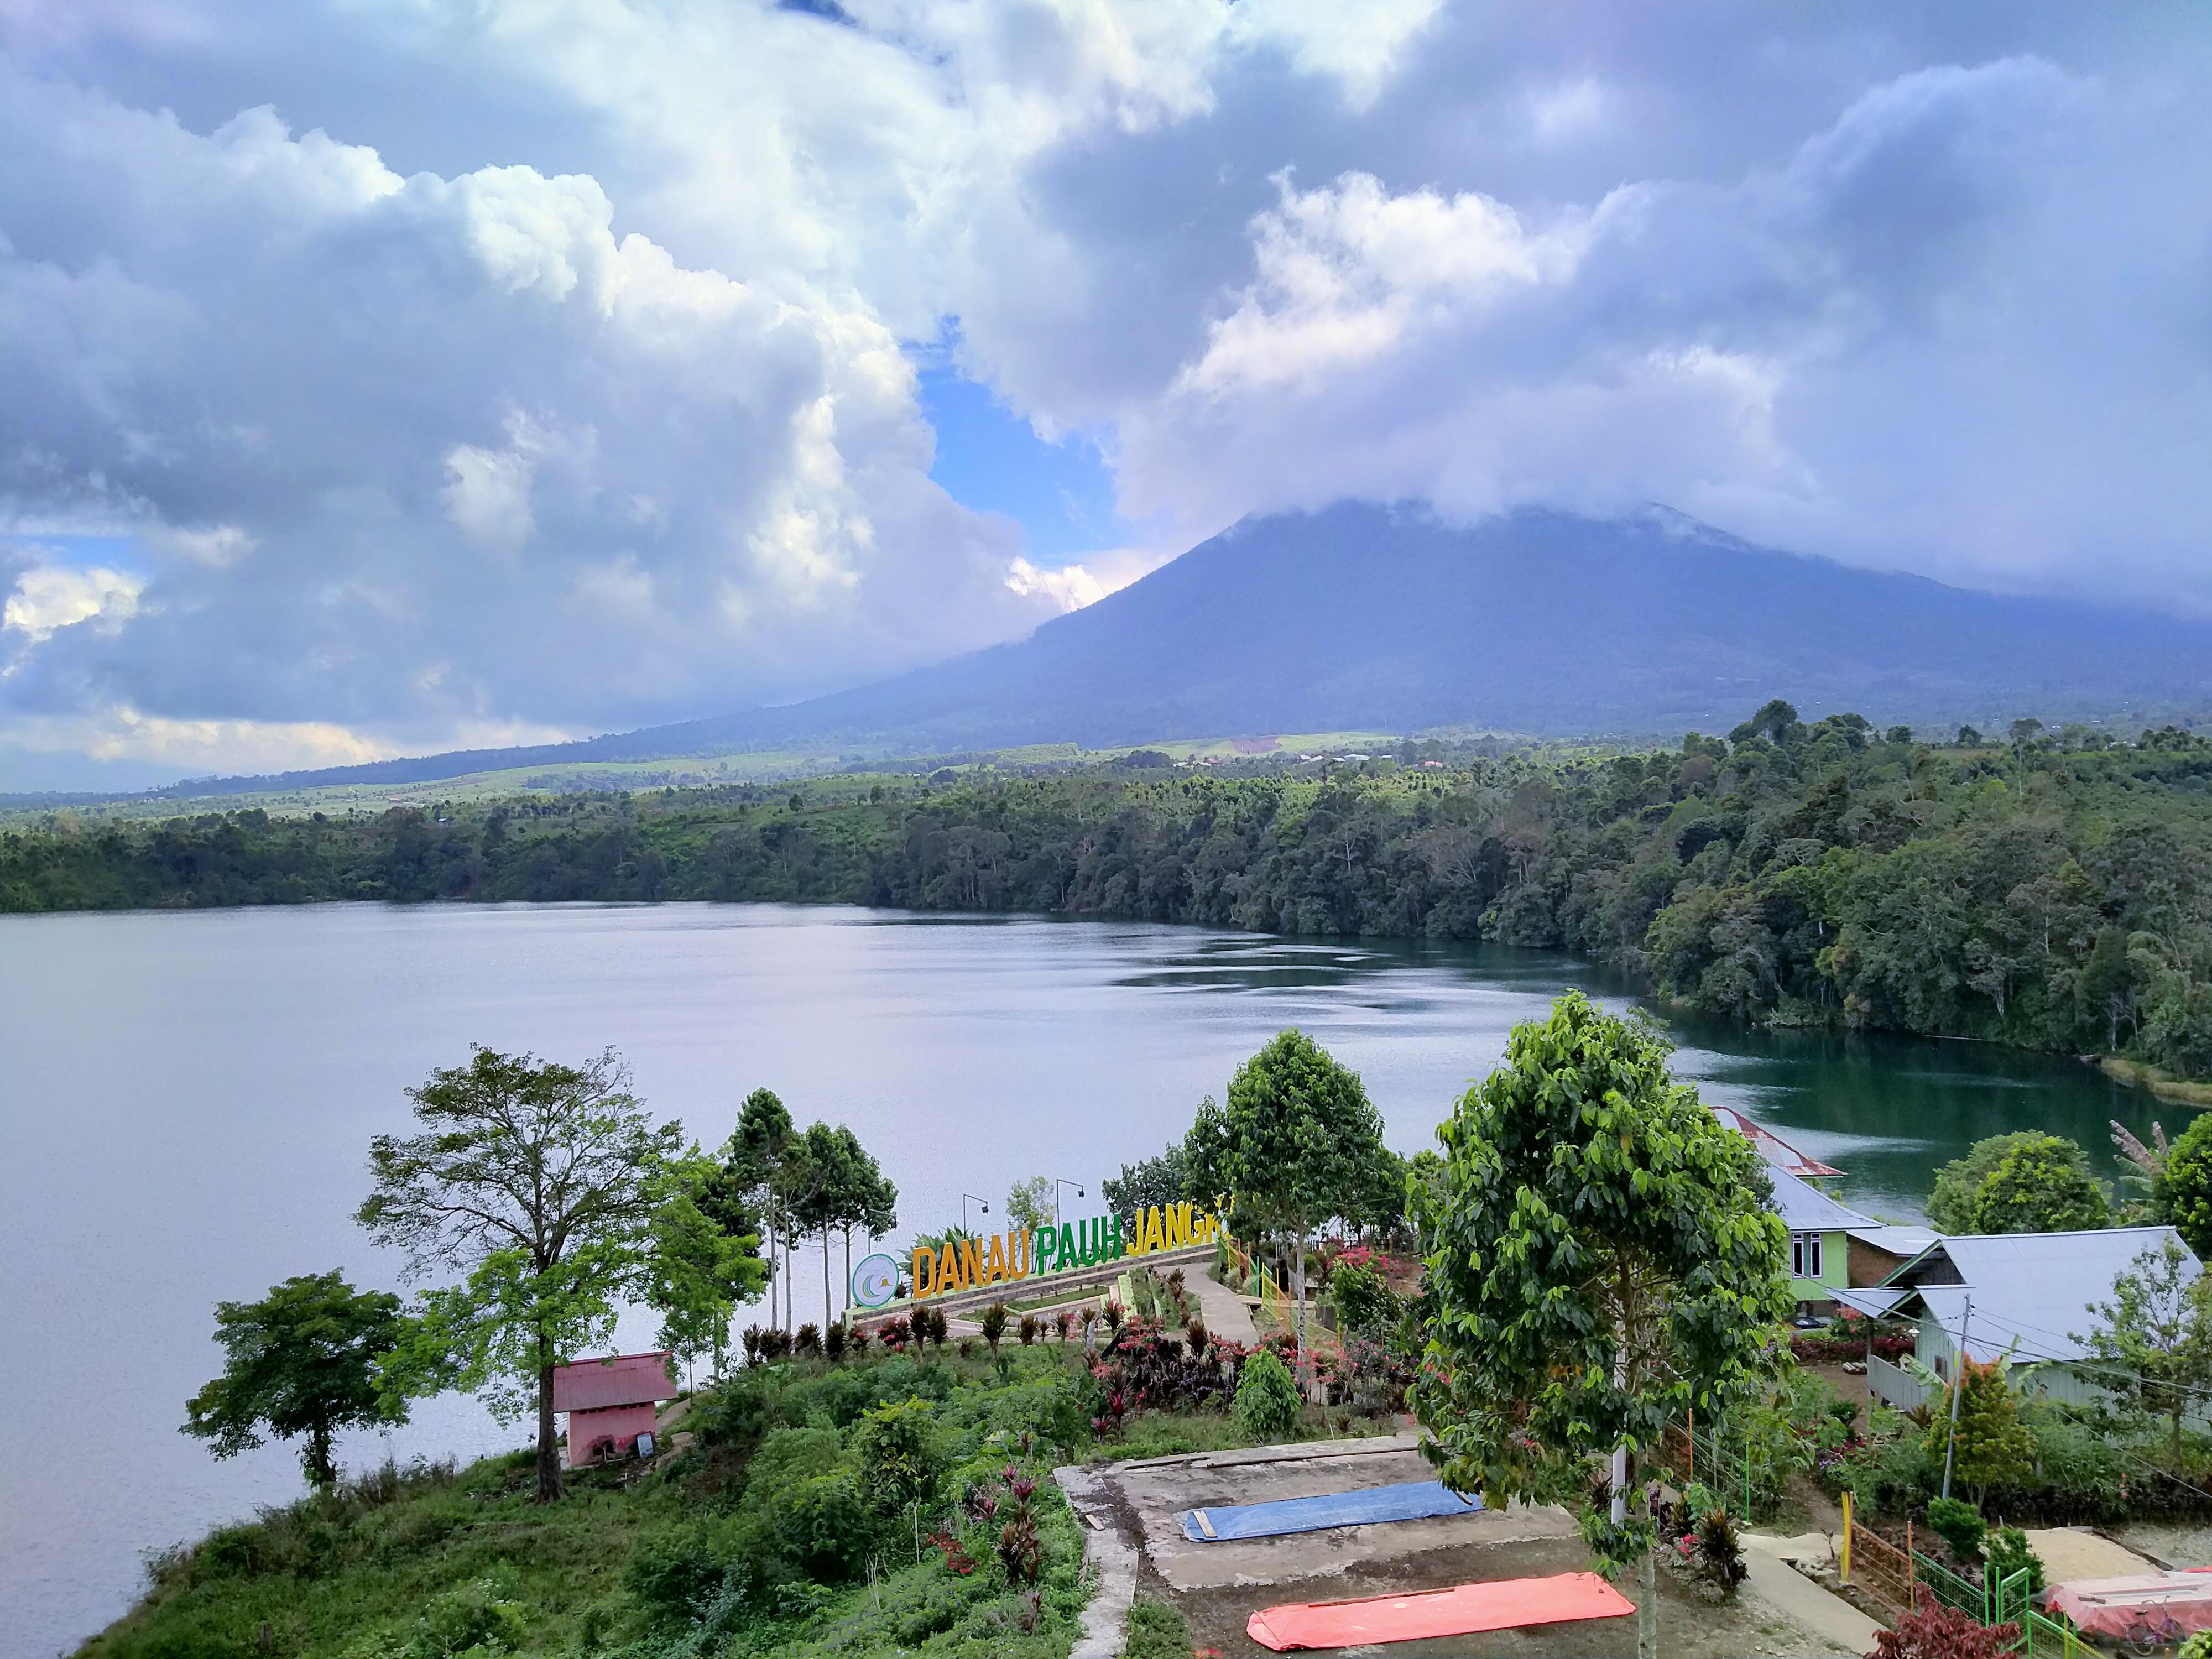 Kabupaten Merangin Wikipedia Bahasa Indonesia Ensiklopedia Bebas